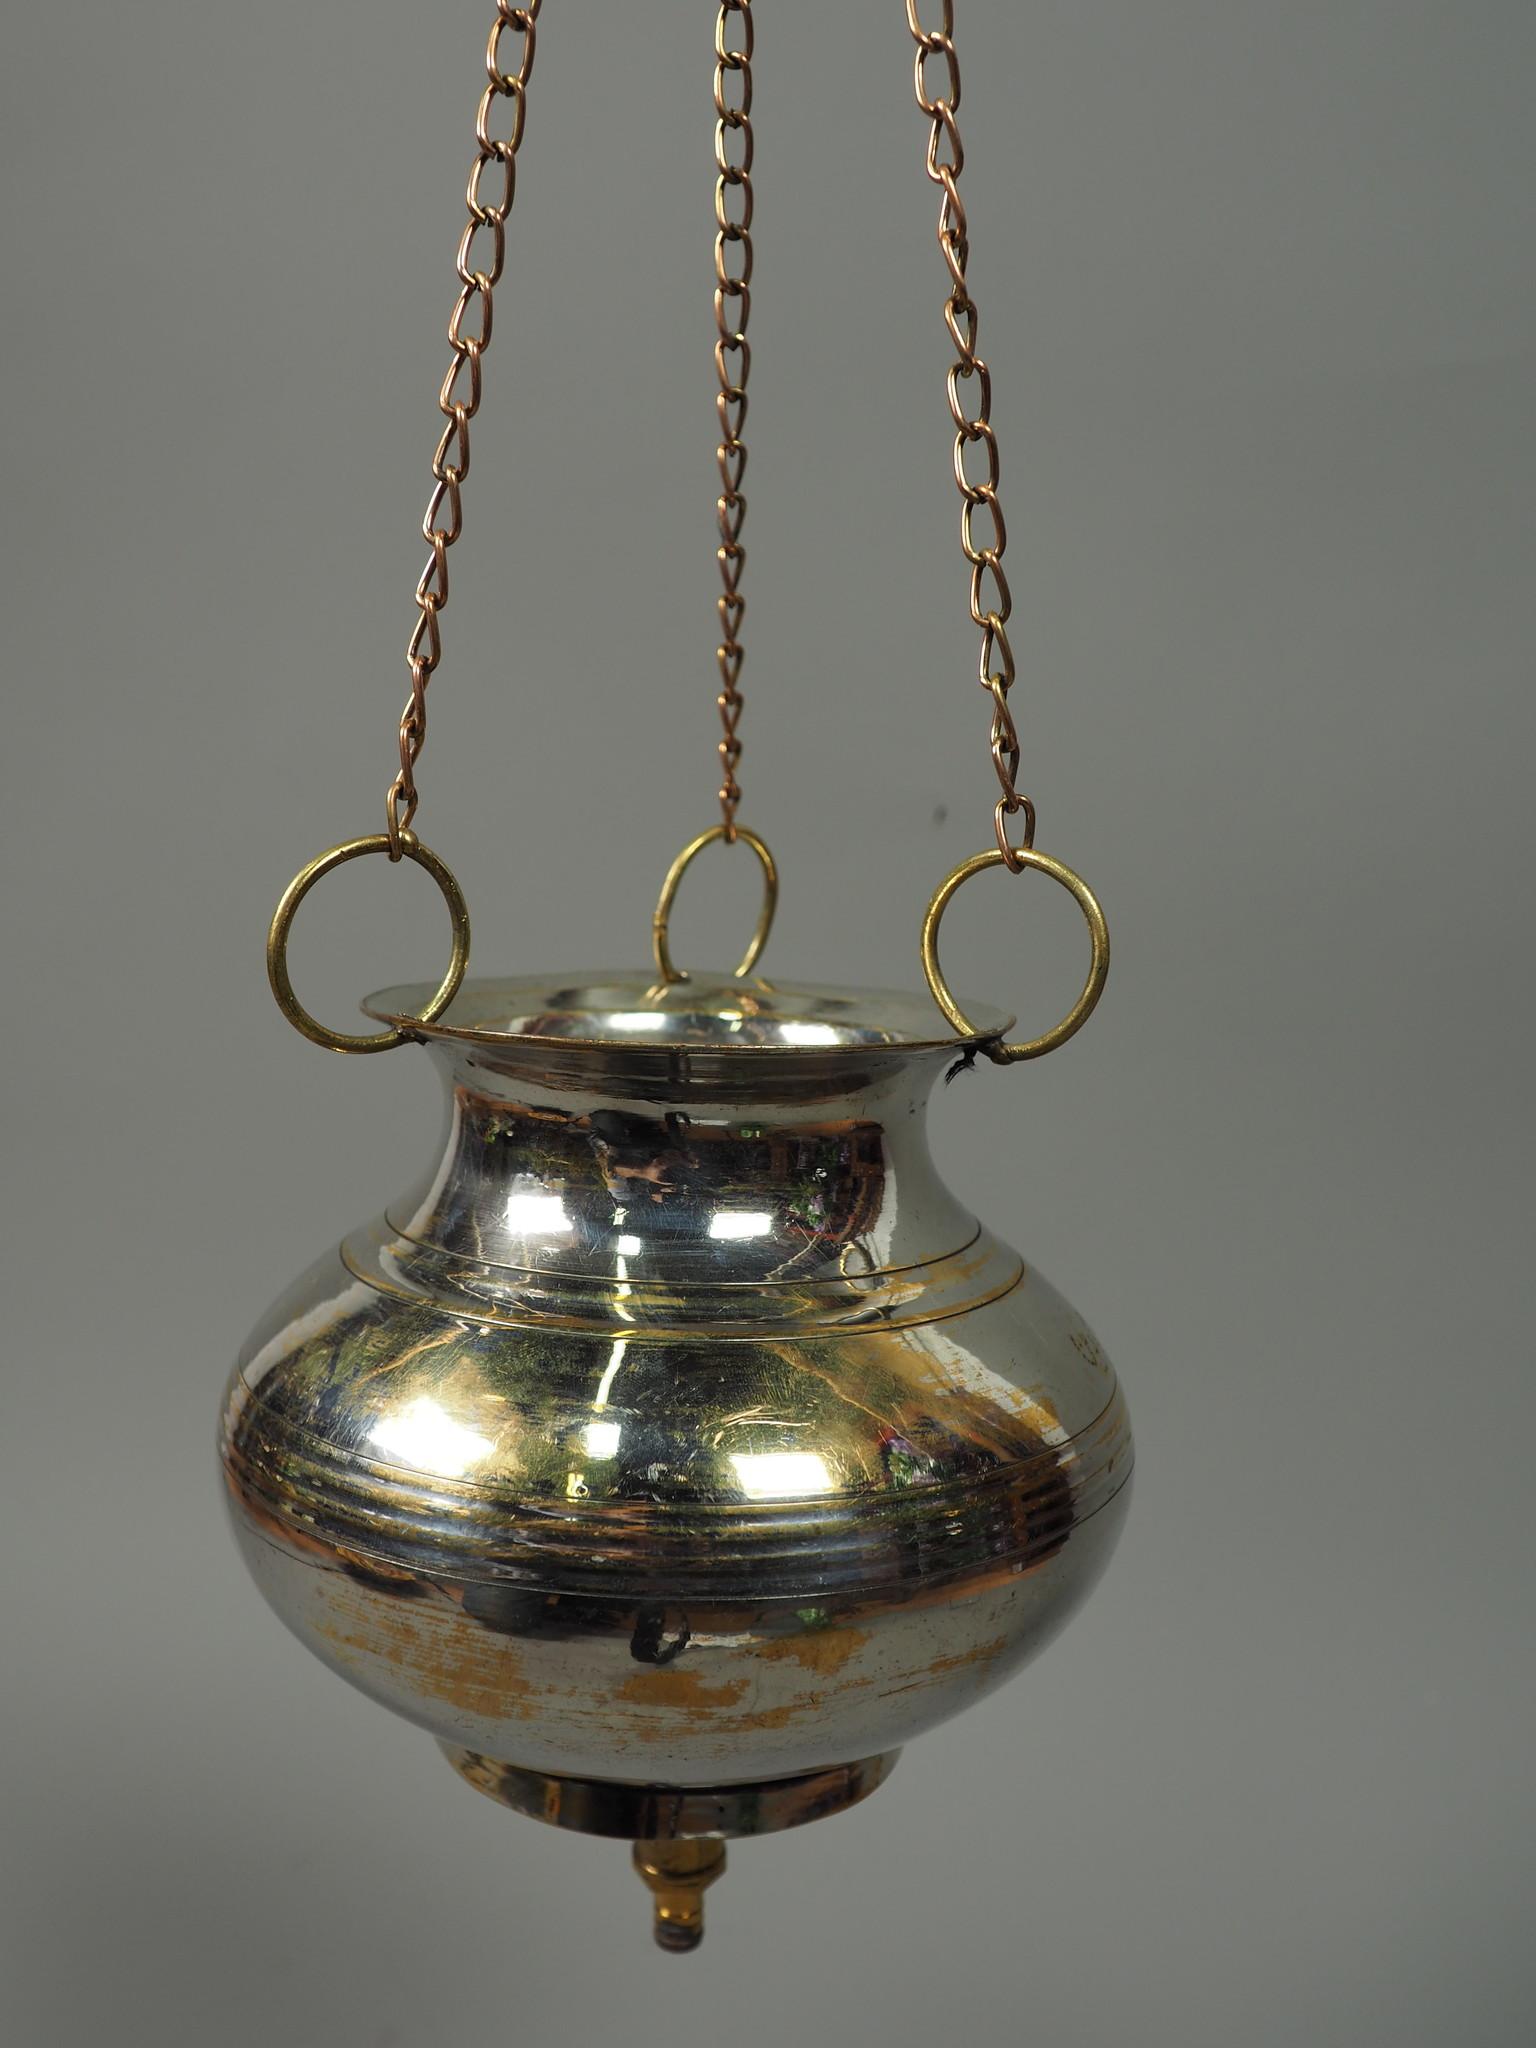 antique solid copper orient Ayurvedic Shirodhara Panchakarma oil therapy Yoga Dhara vessel Patra india -No:  21/20